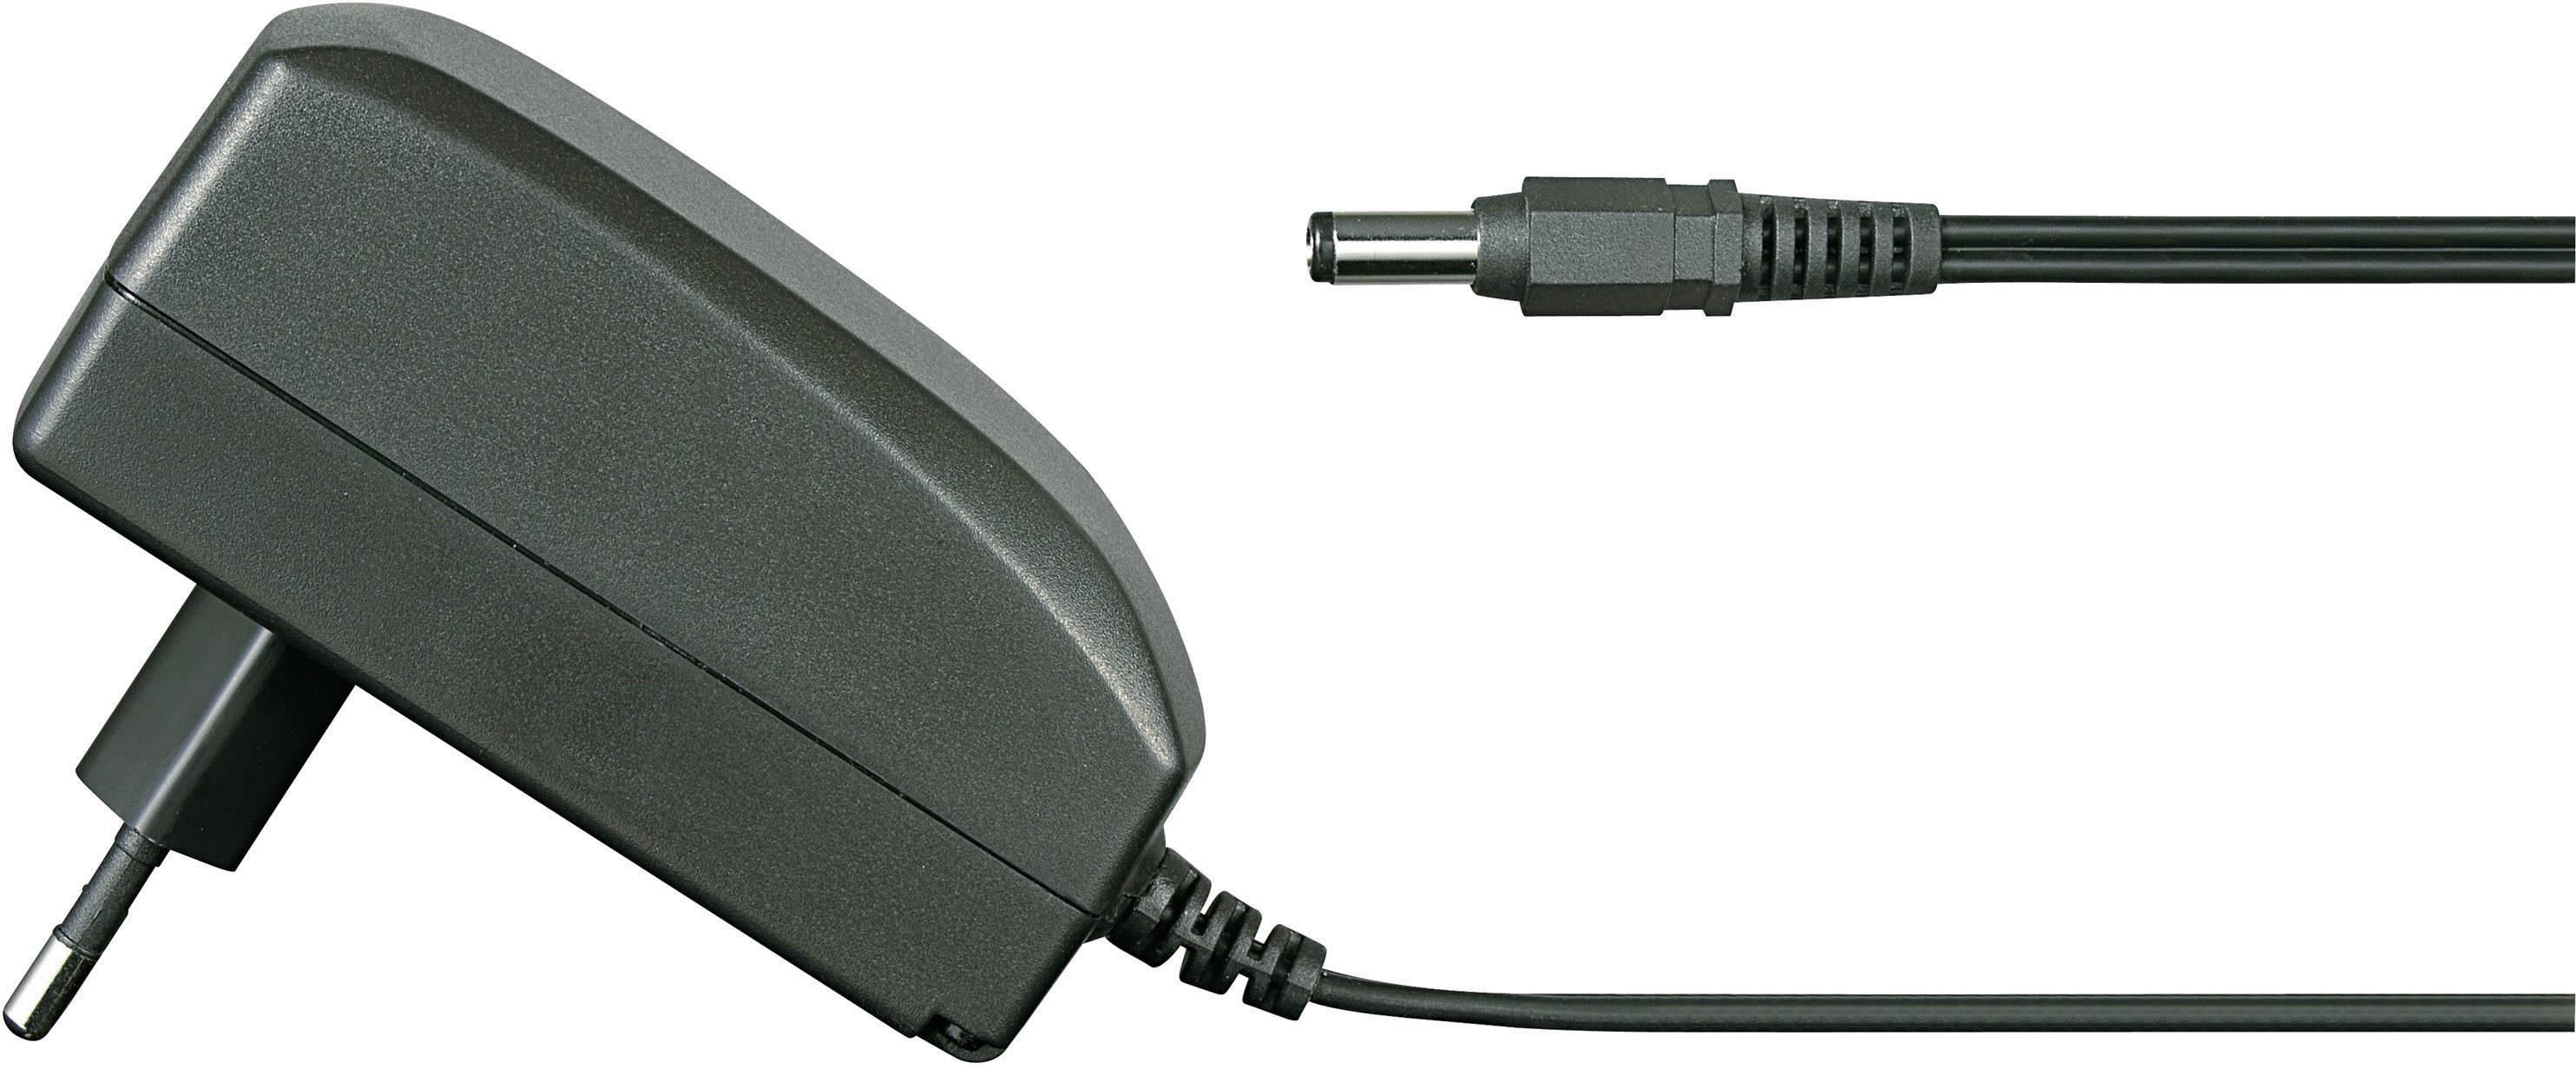 Síťový adaptér Voltcraft FPPS 24-27W, 24 V/DC, 27 W